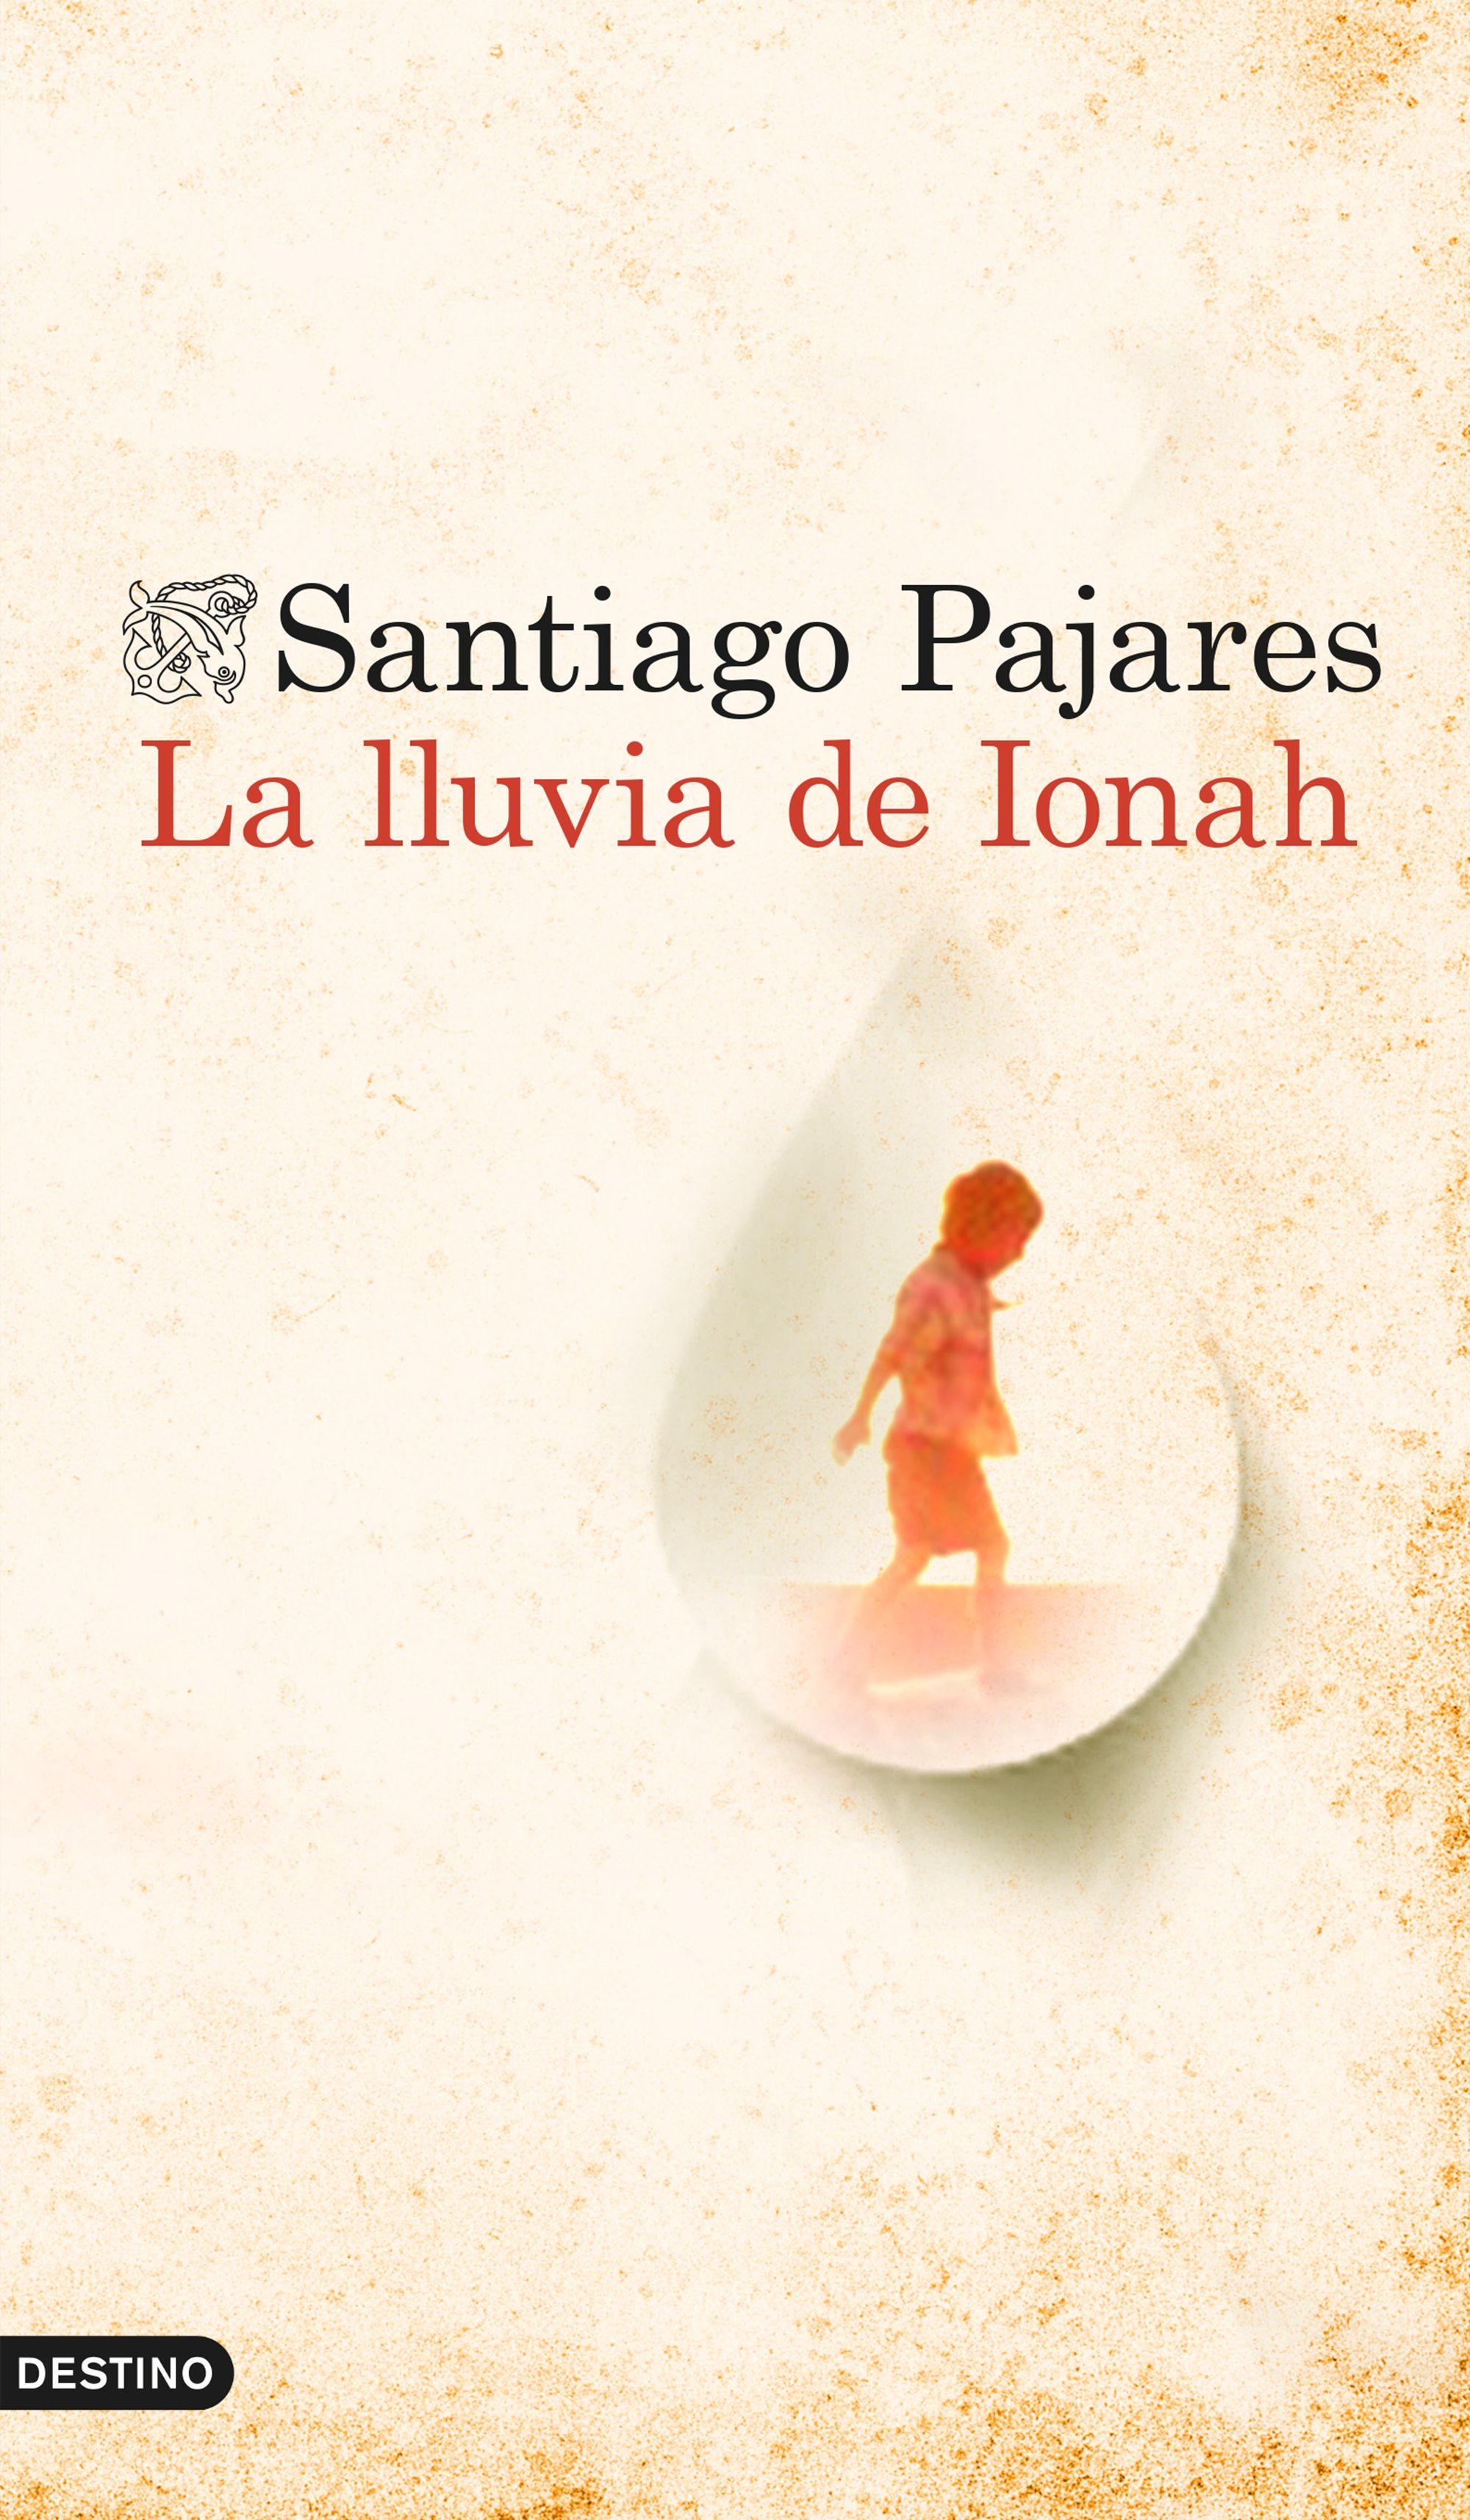 La lluvia de Ionah - Santiago Pajares Portada